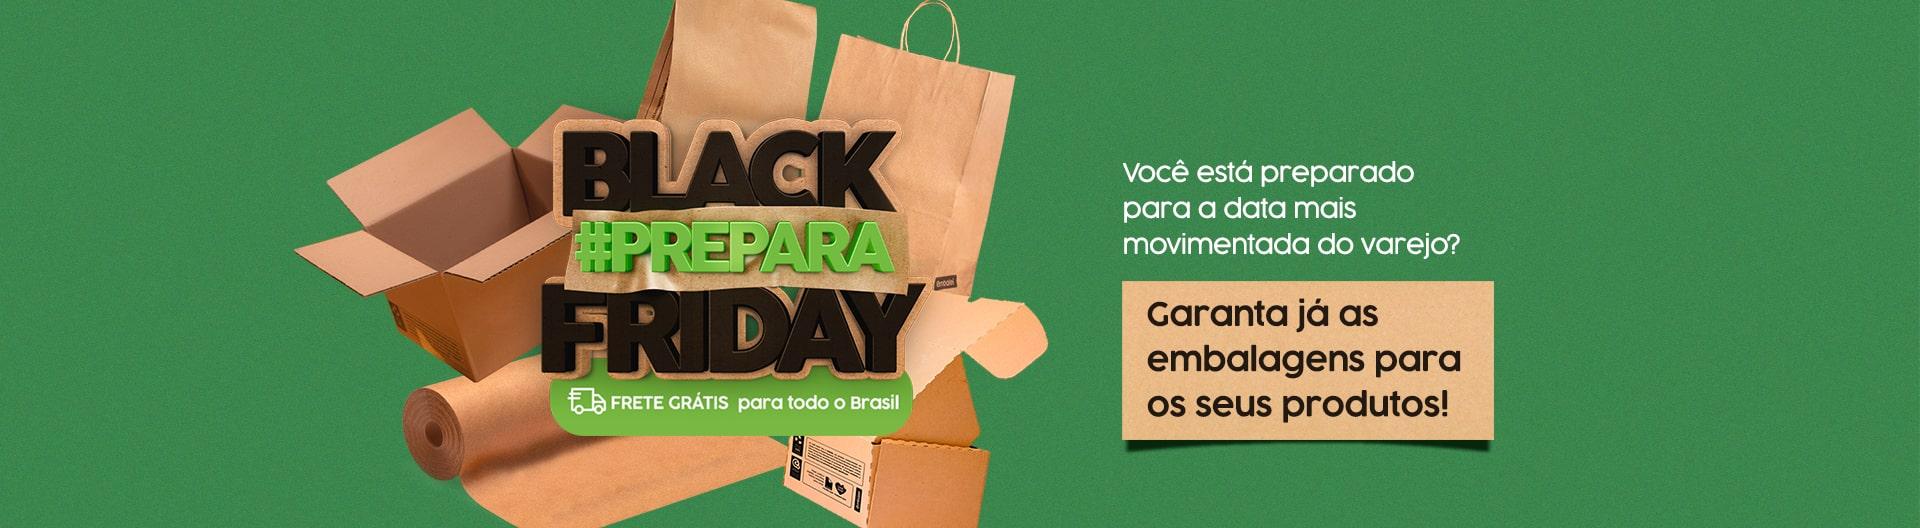 Black Friday - Fase 1